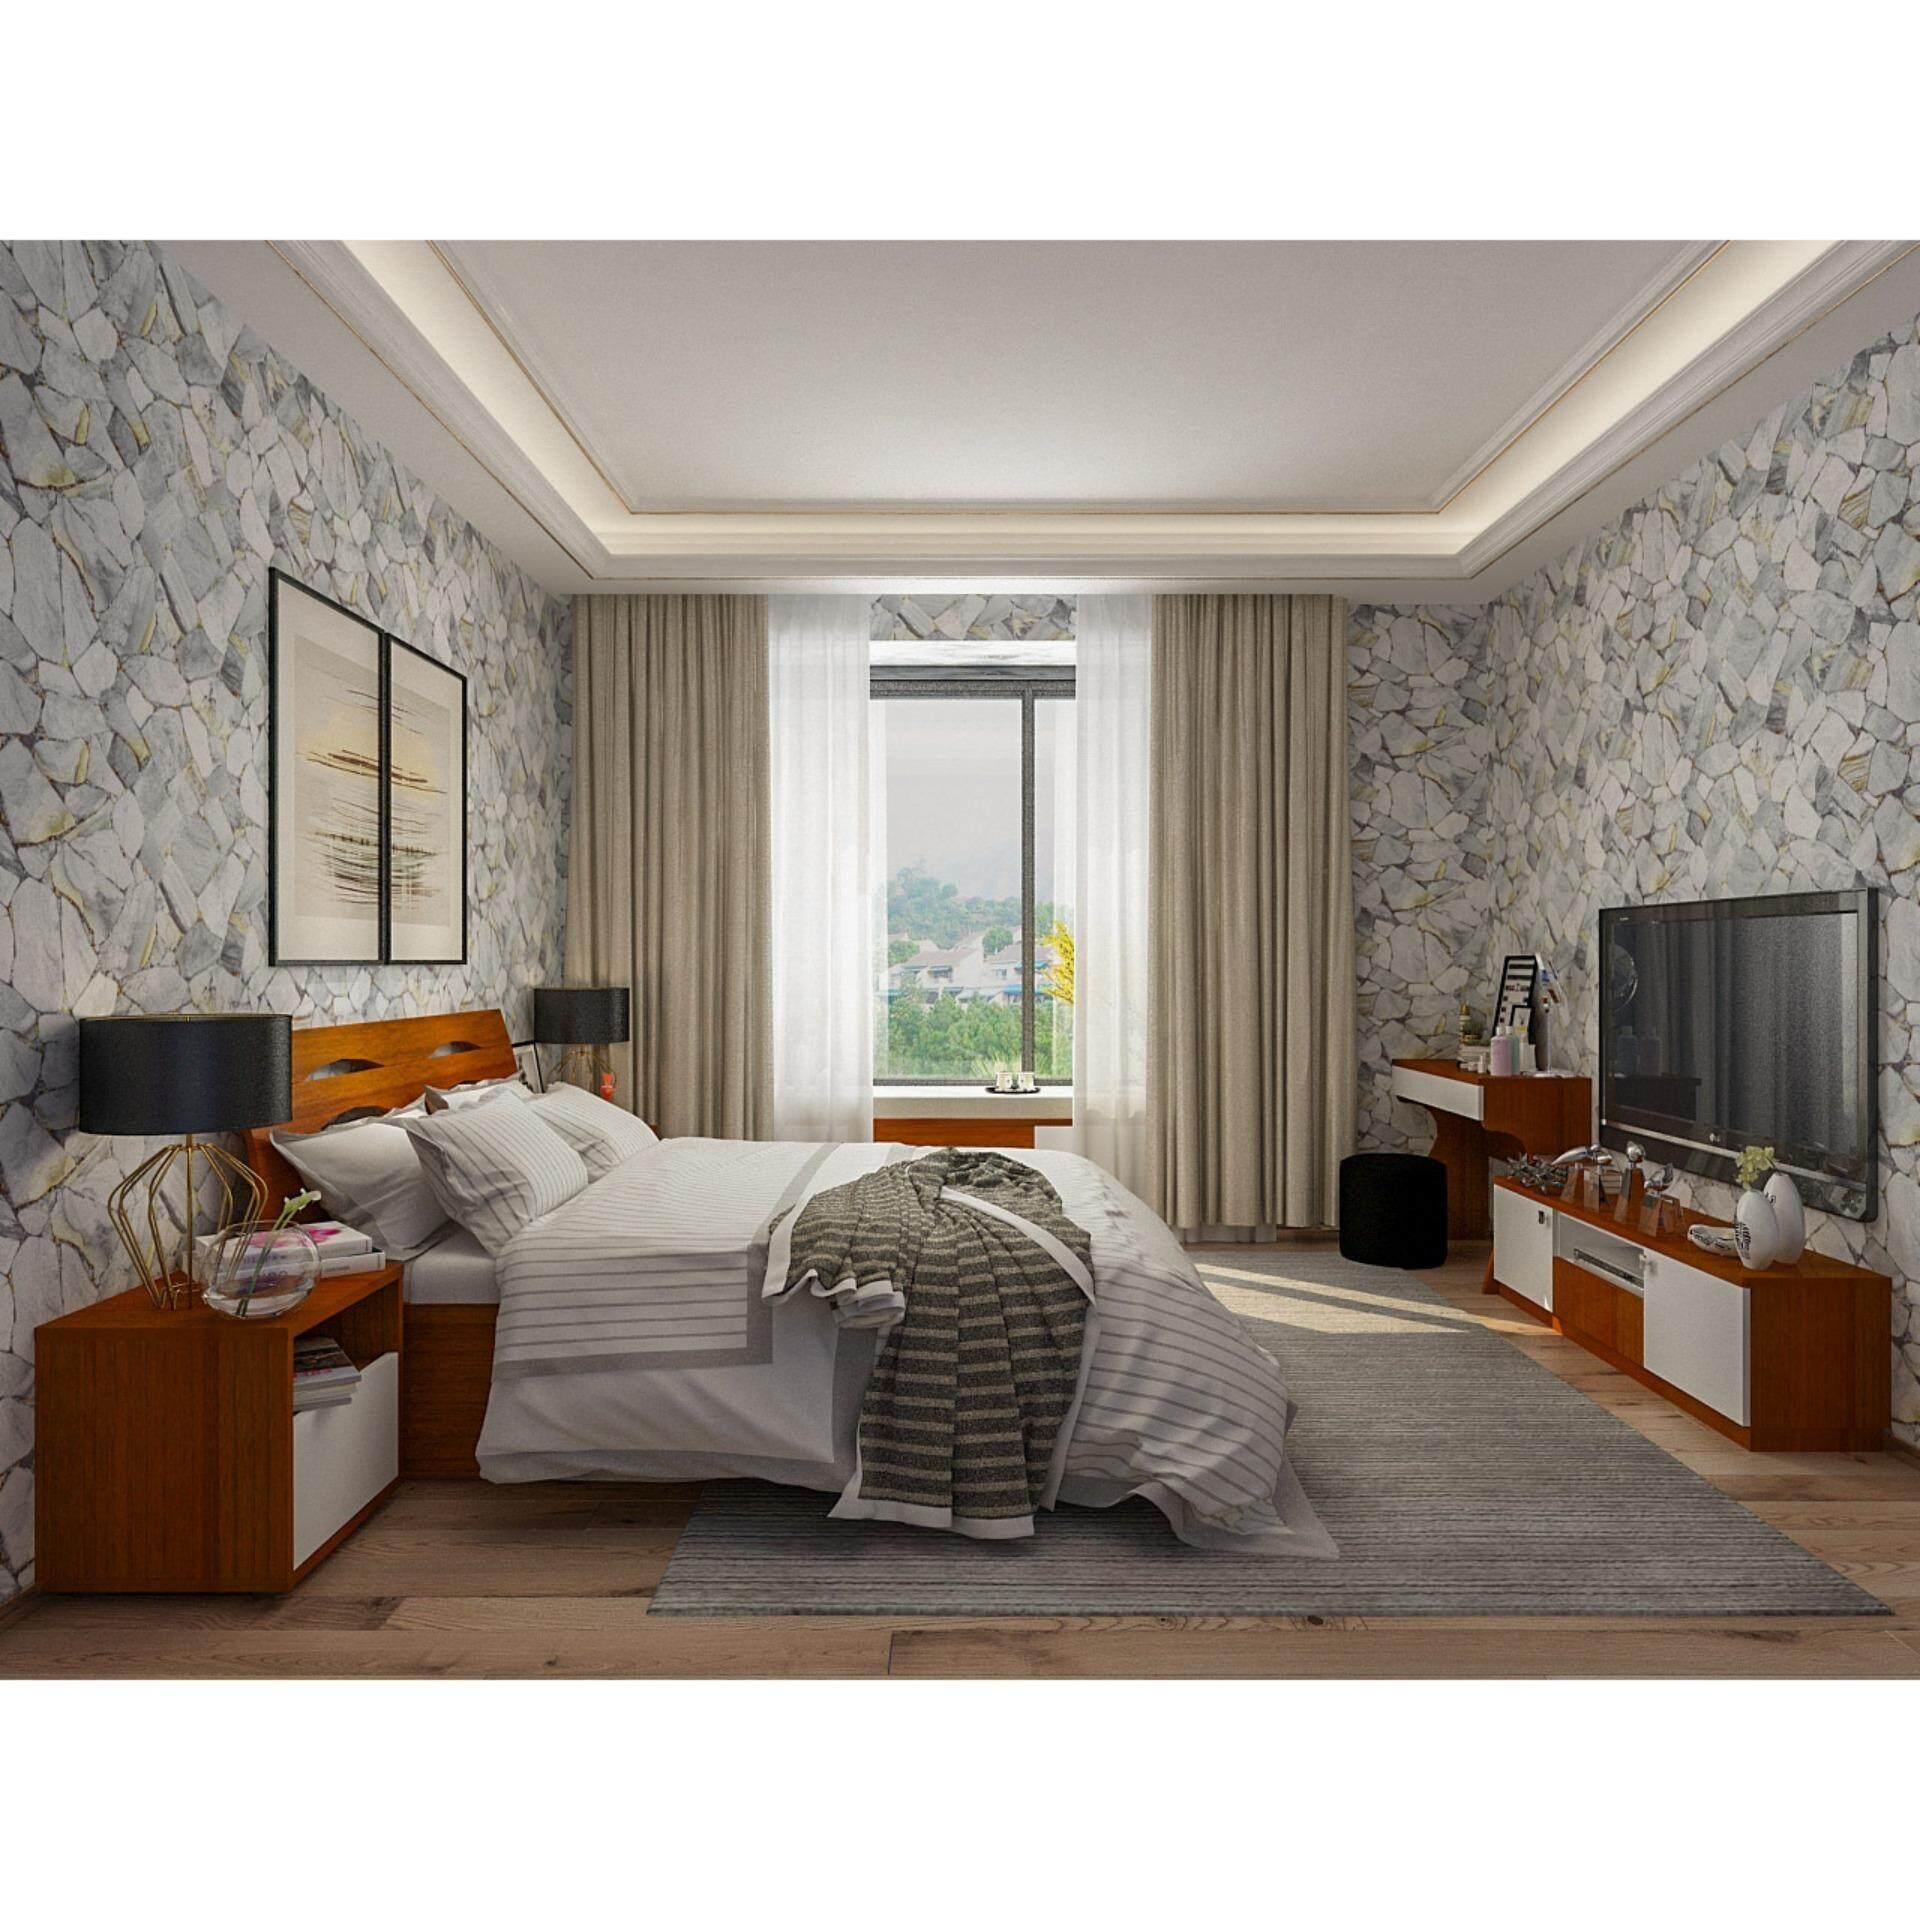 3D Stone Premium Korea Wallpaper Natural-II 87028-2